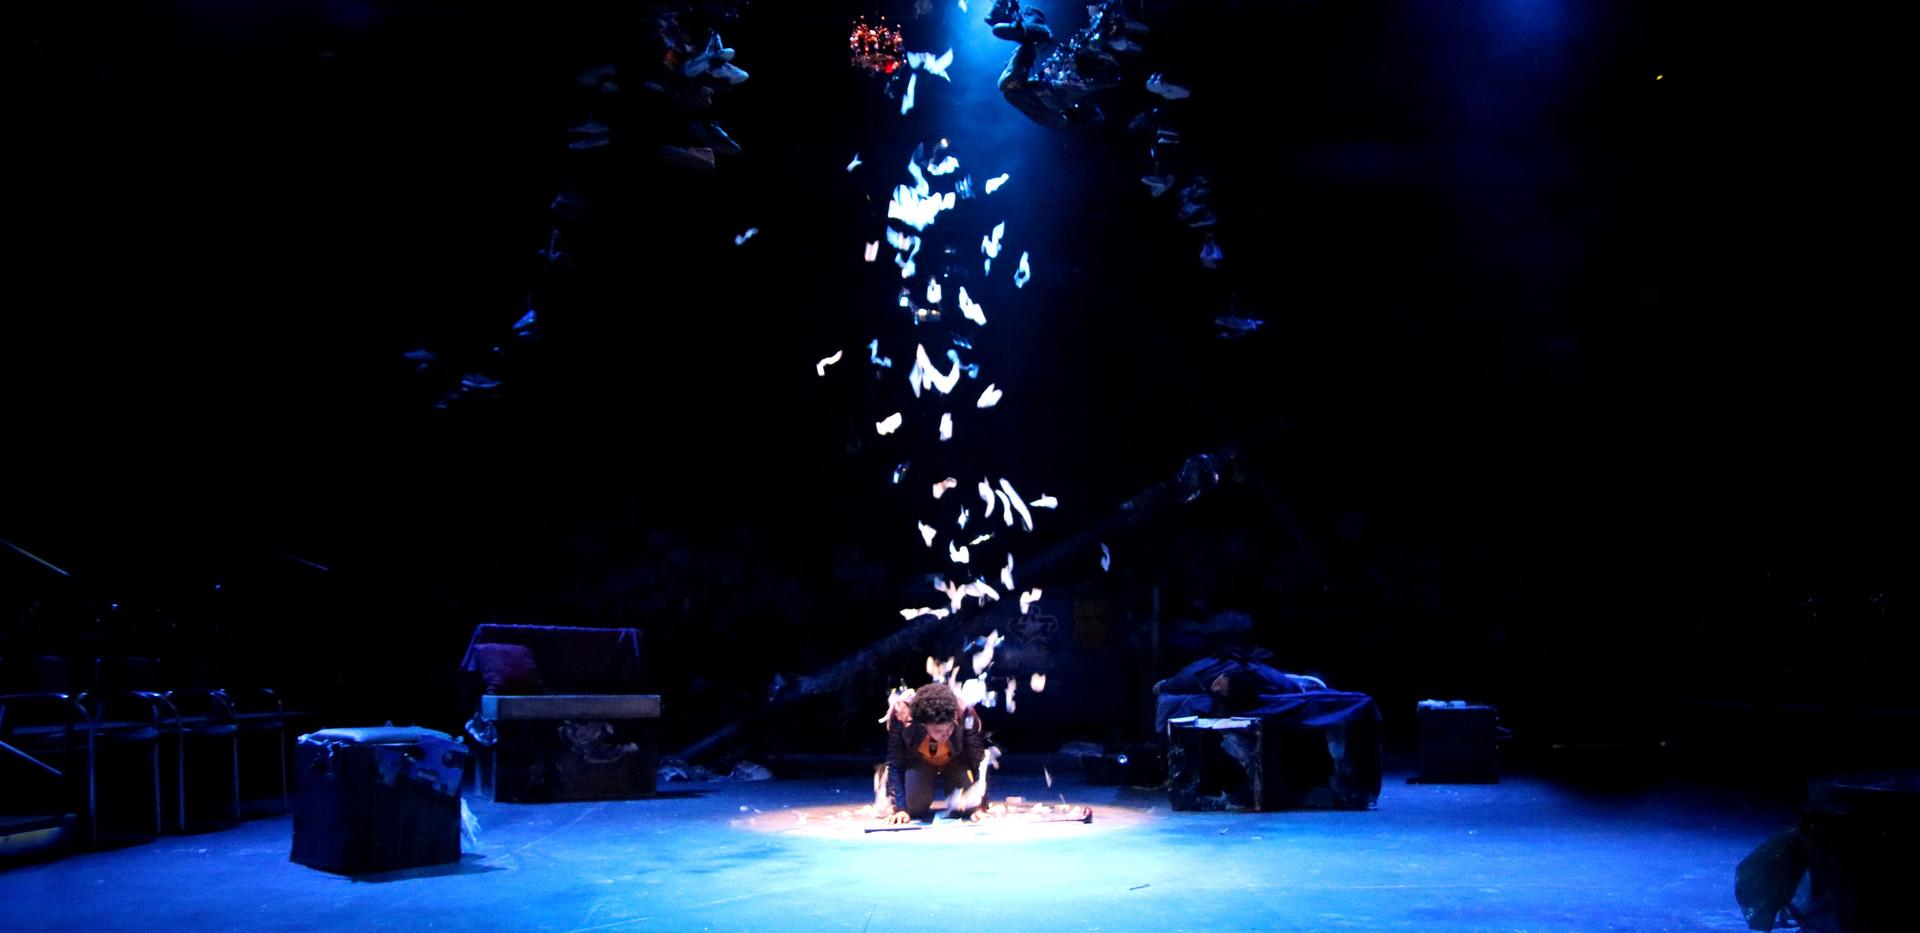 Marisol Wings of Peace Dissolve